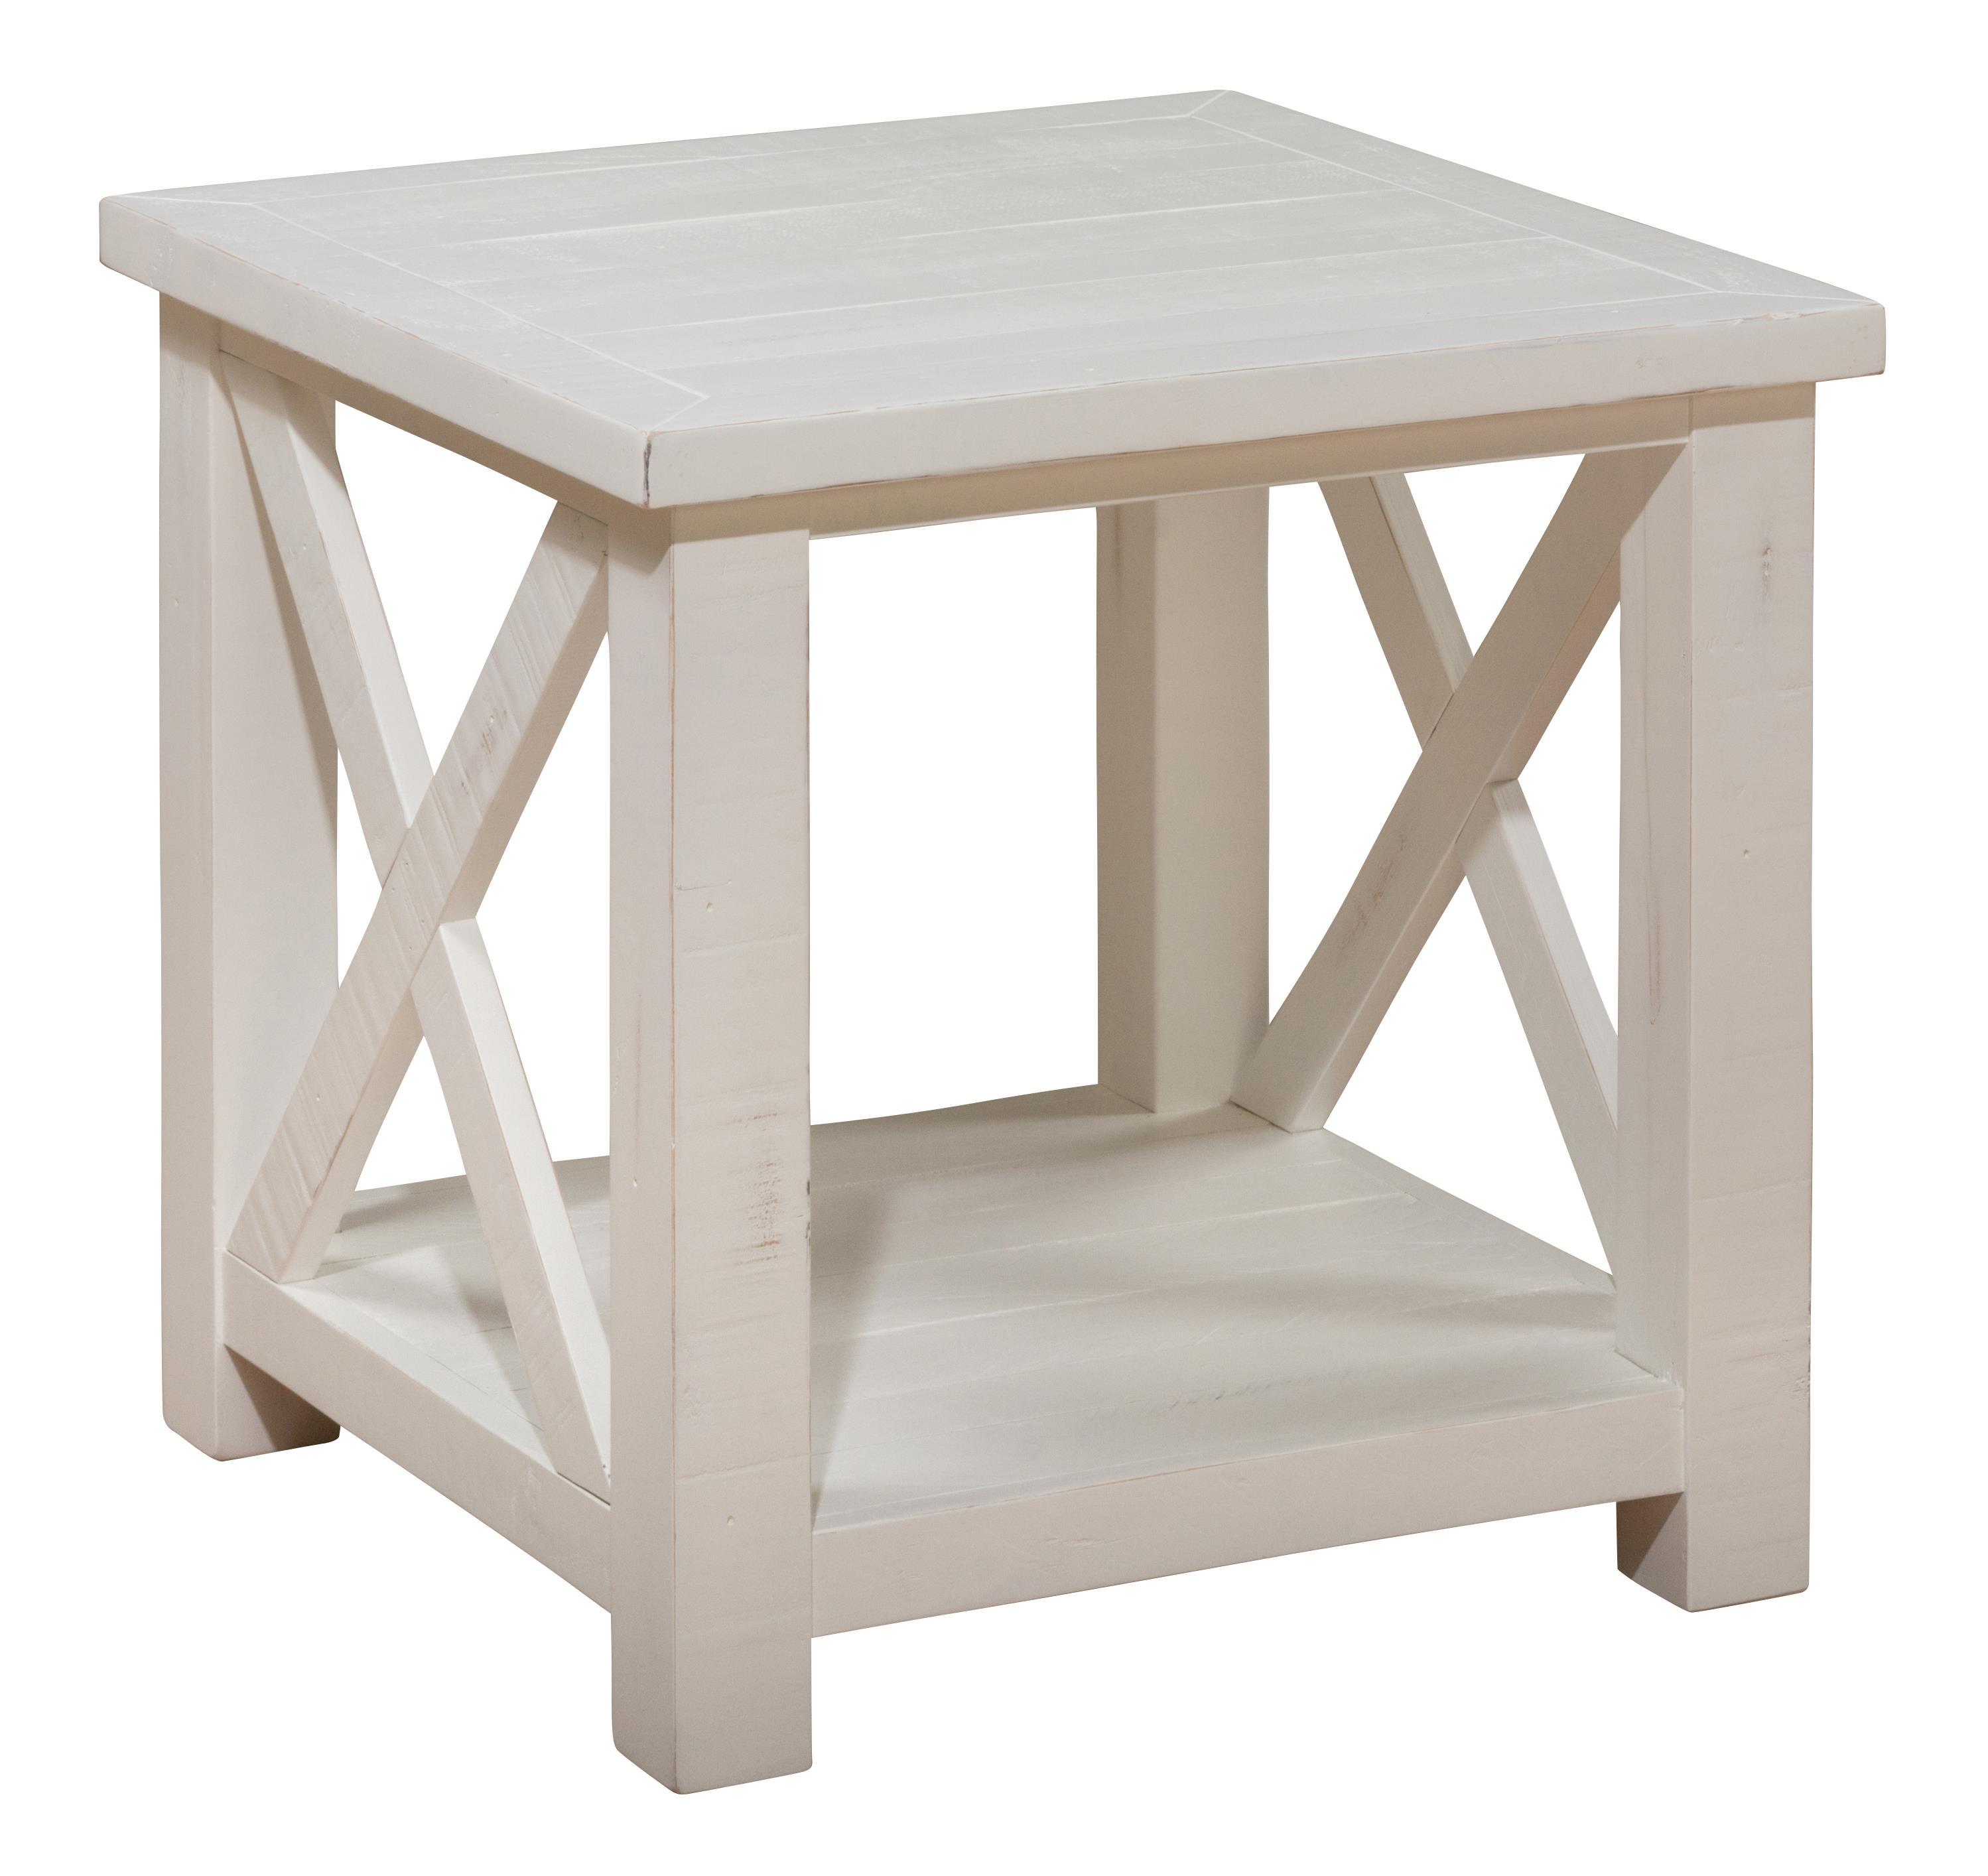 Madaket Reclaimed Pine End Table by Jofran at Johnny Janosik